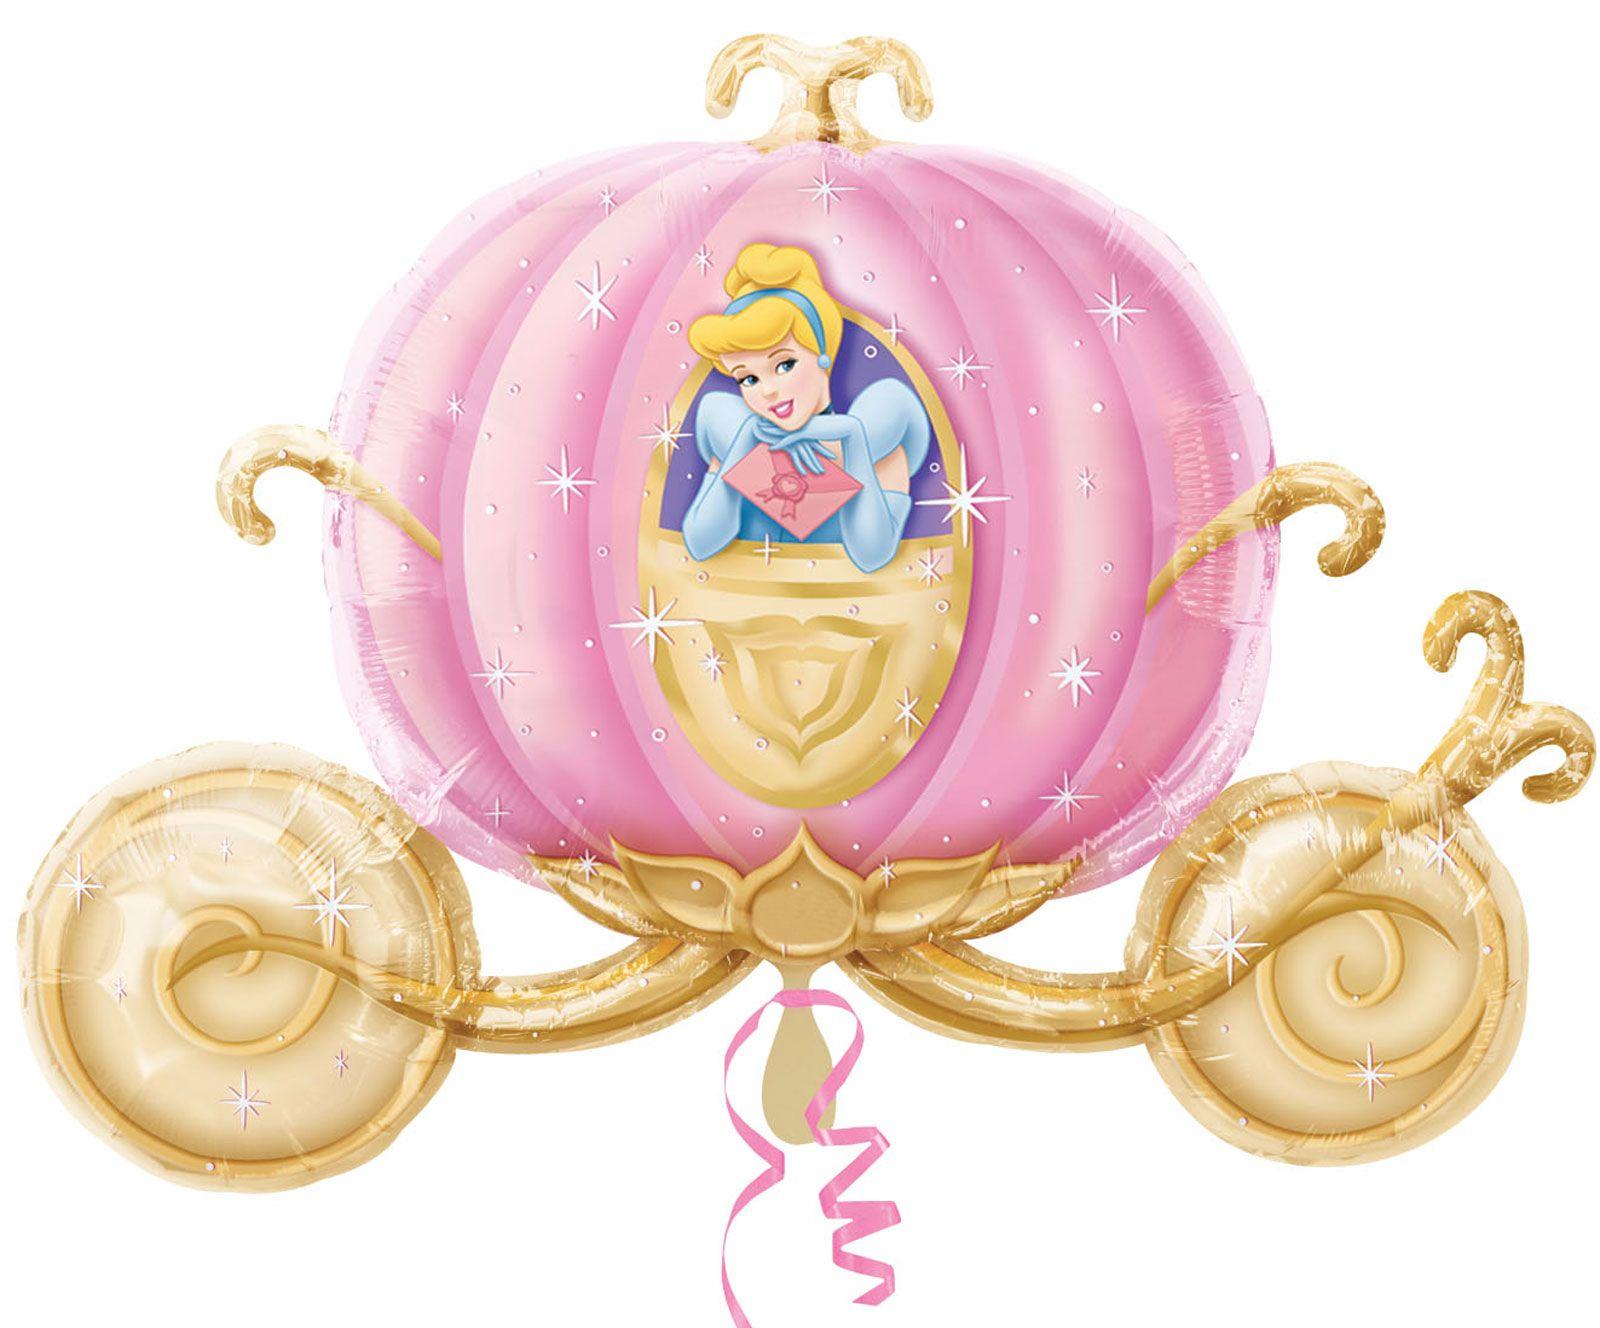 png free Disney princess shaped jumbo. Carriage clipart cinderella baby.